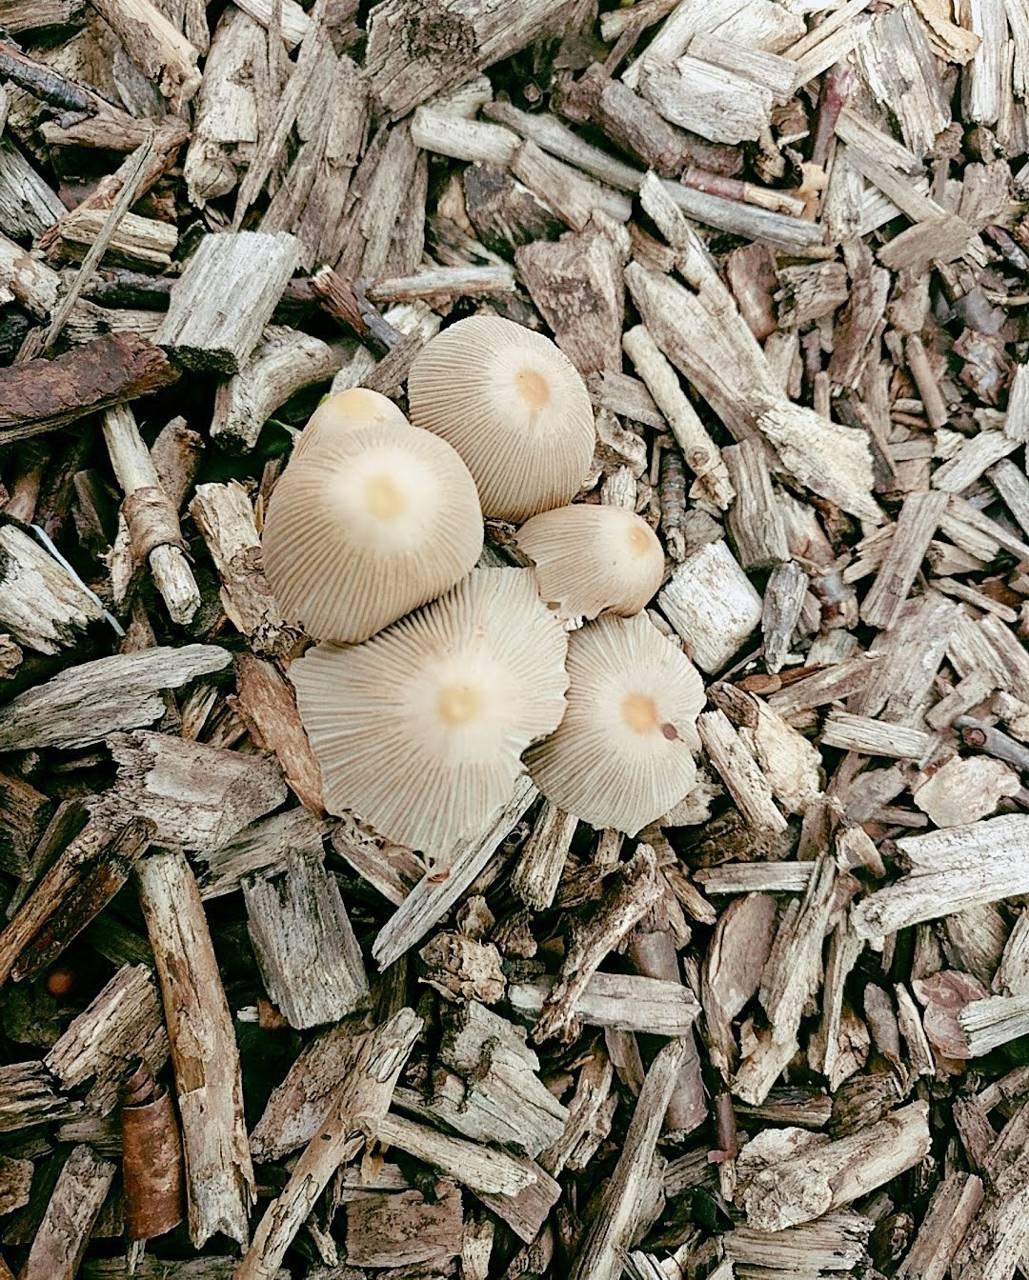 Mushroom Expedition